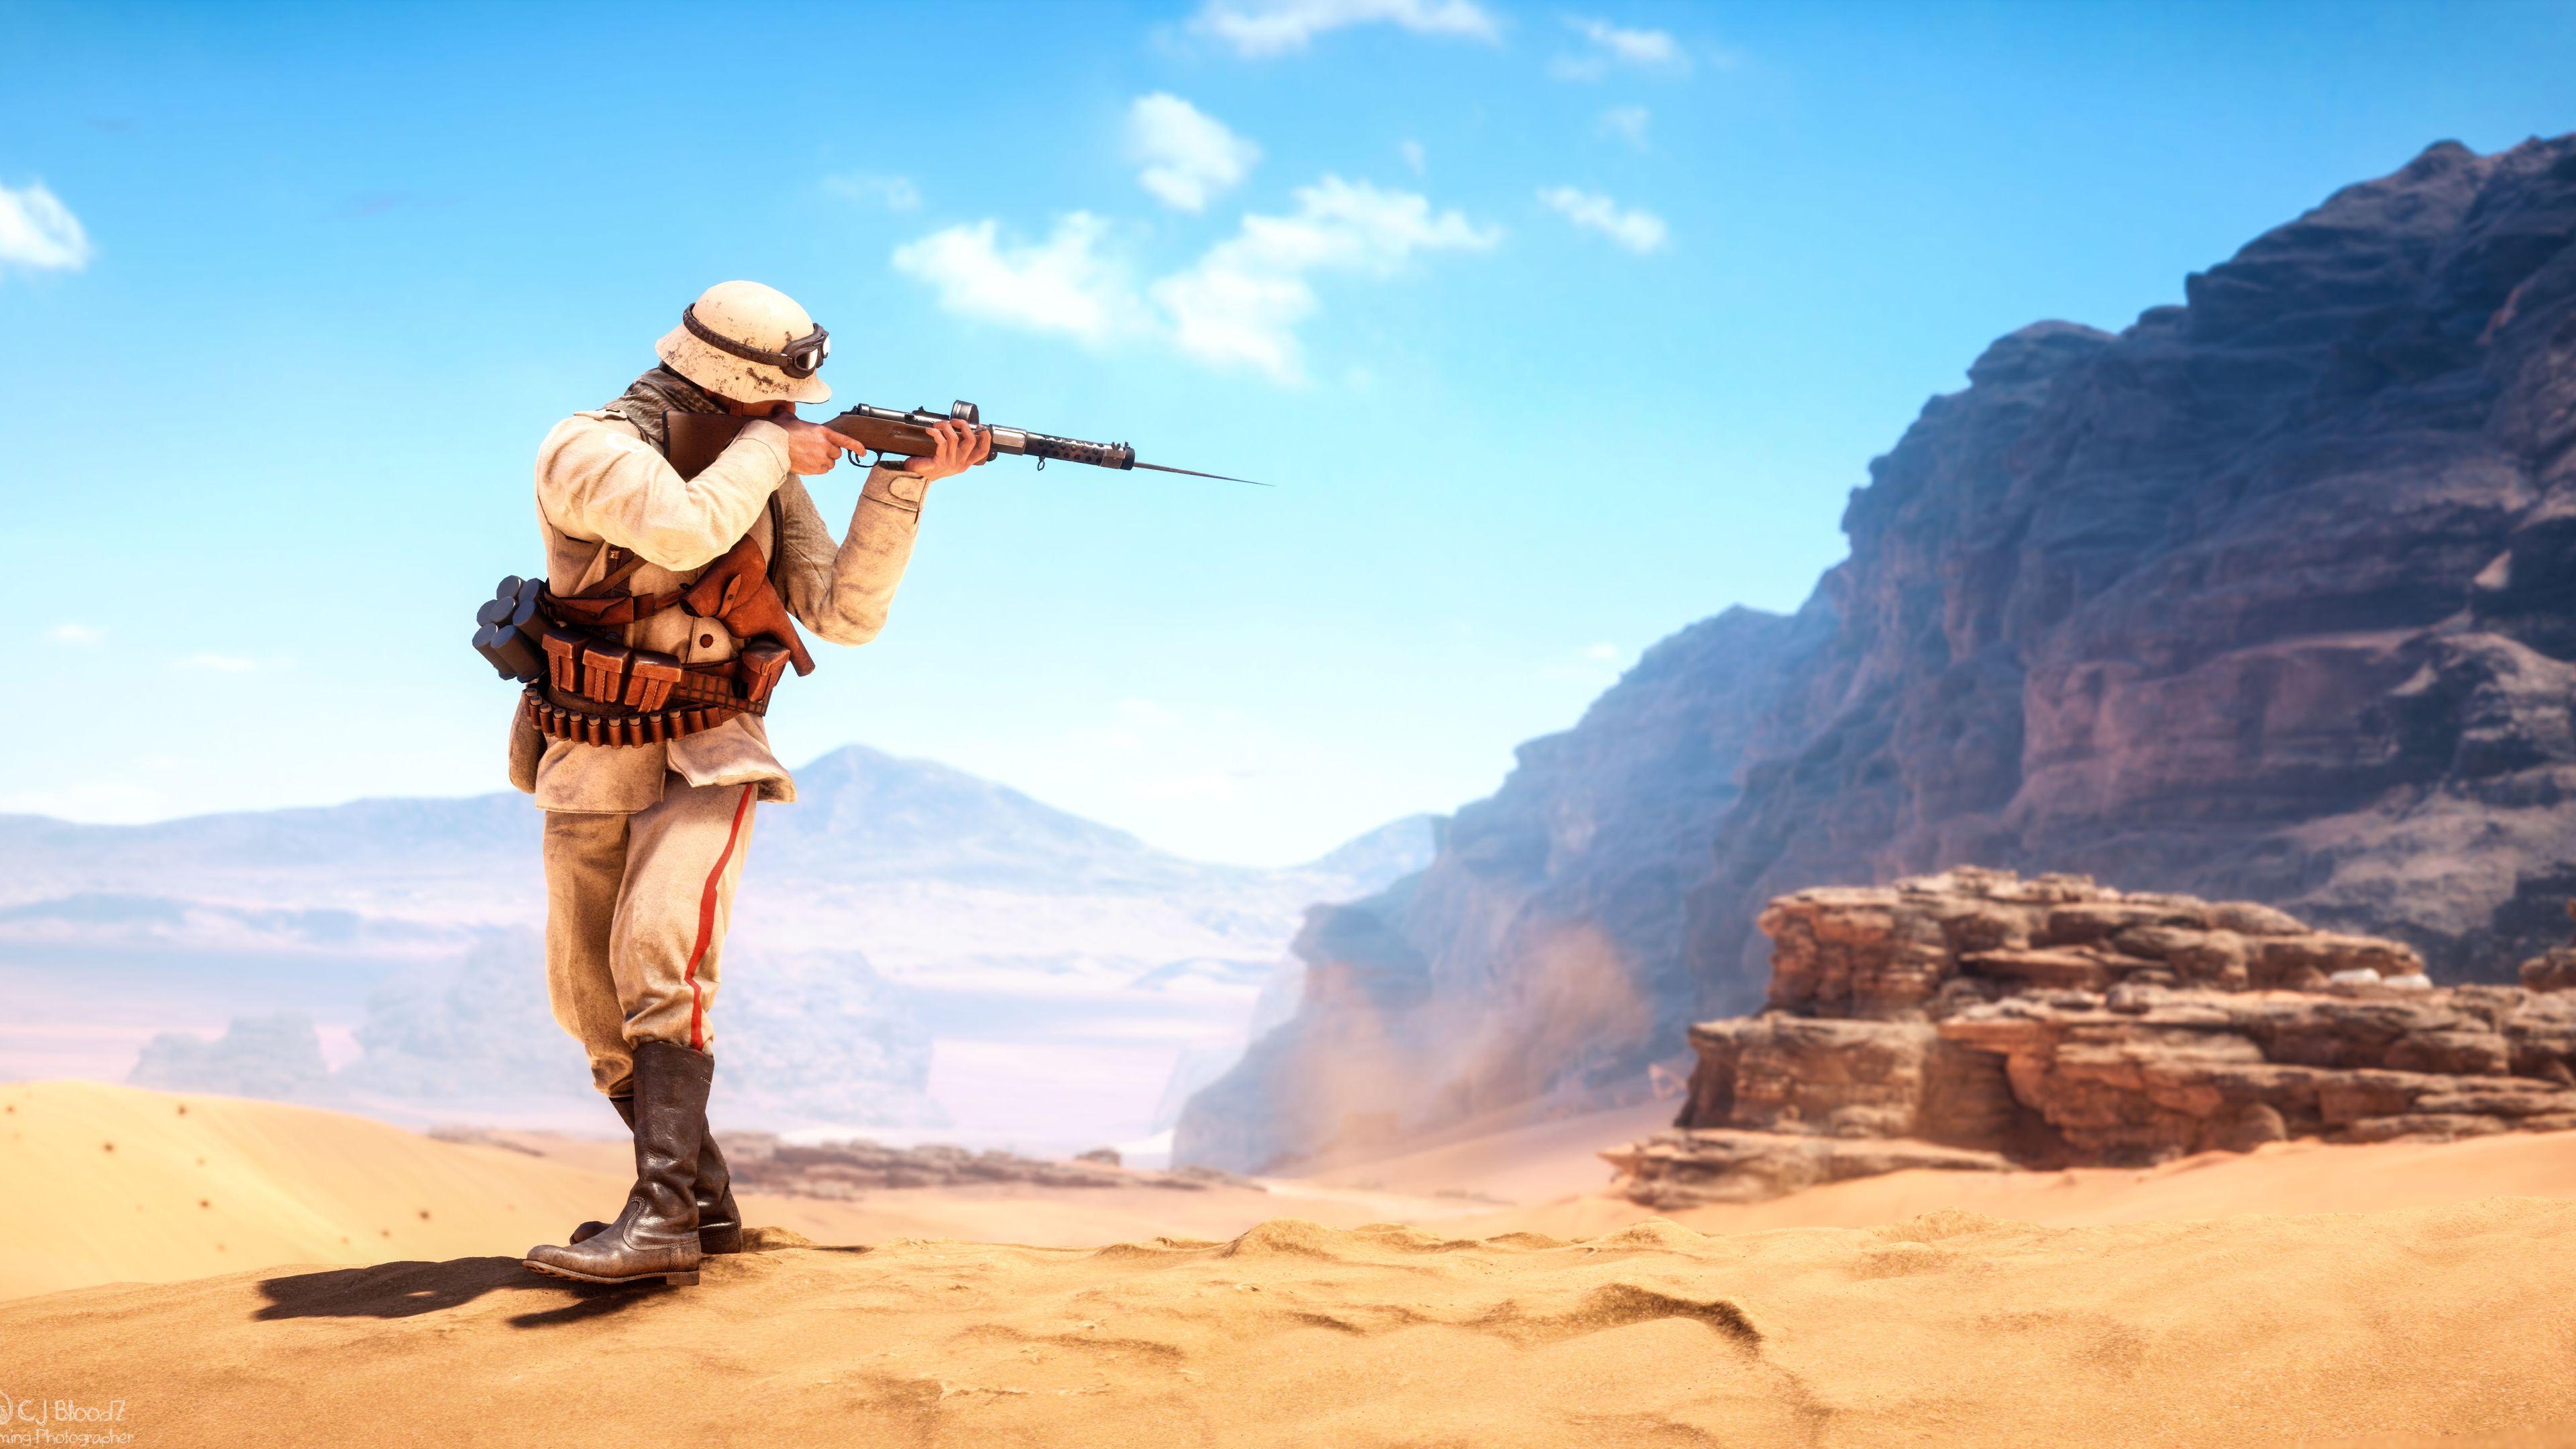 Wallpaper 4k Battlefield1 4k 2019 Games Wallpapers 4k